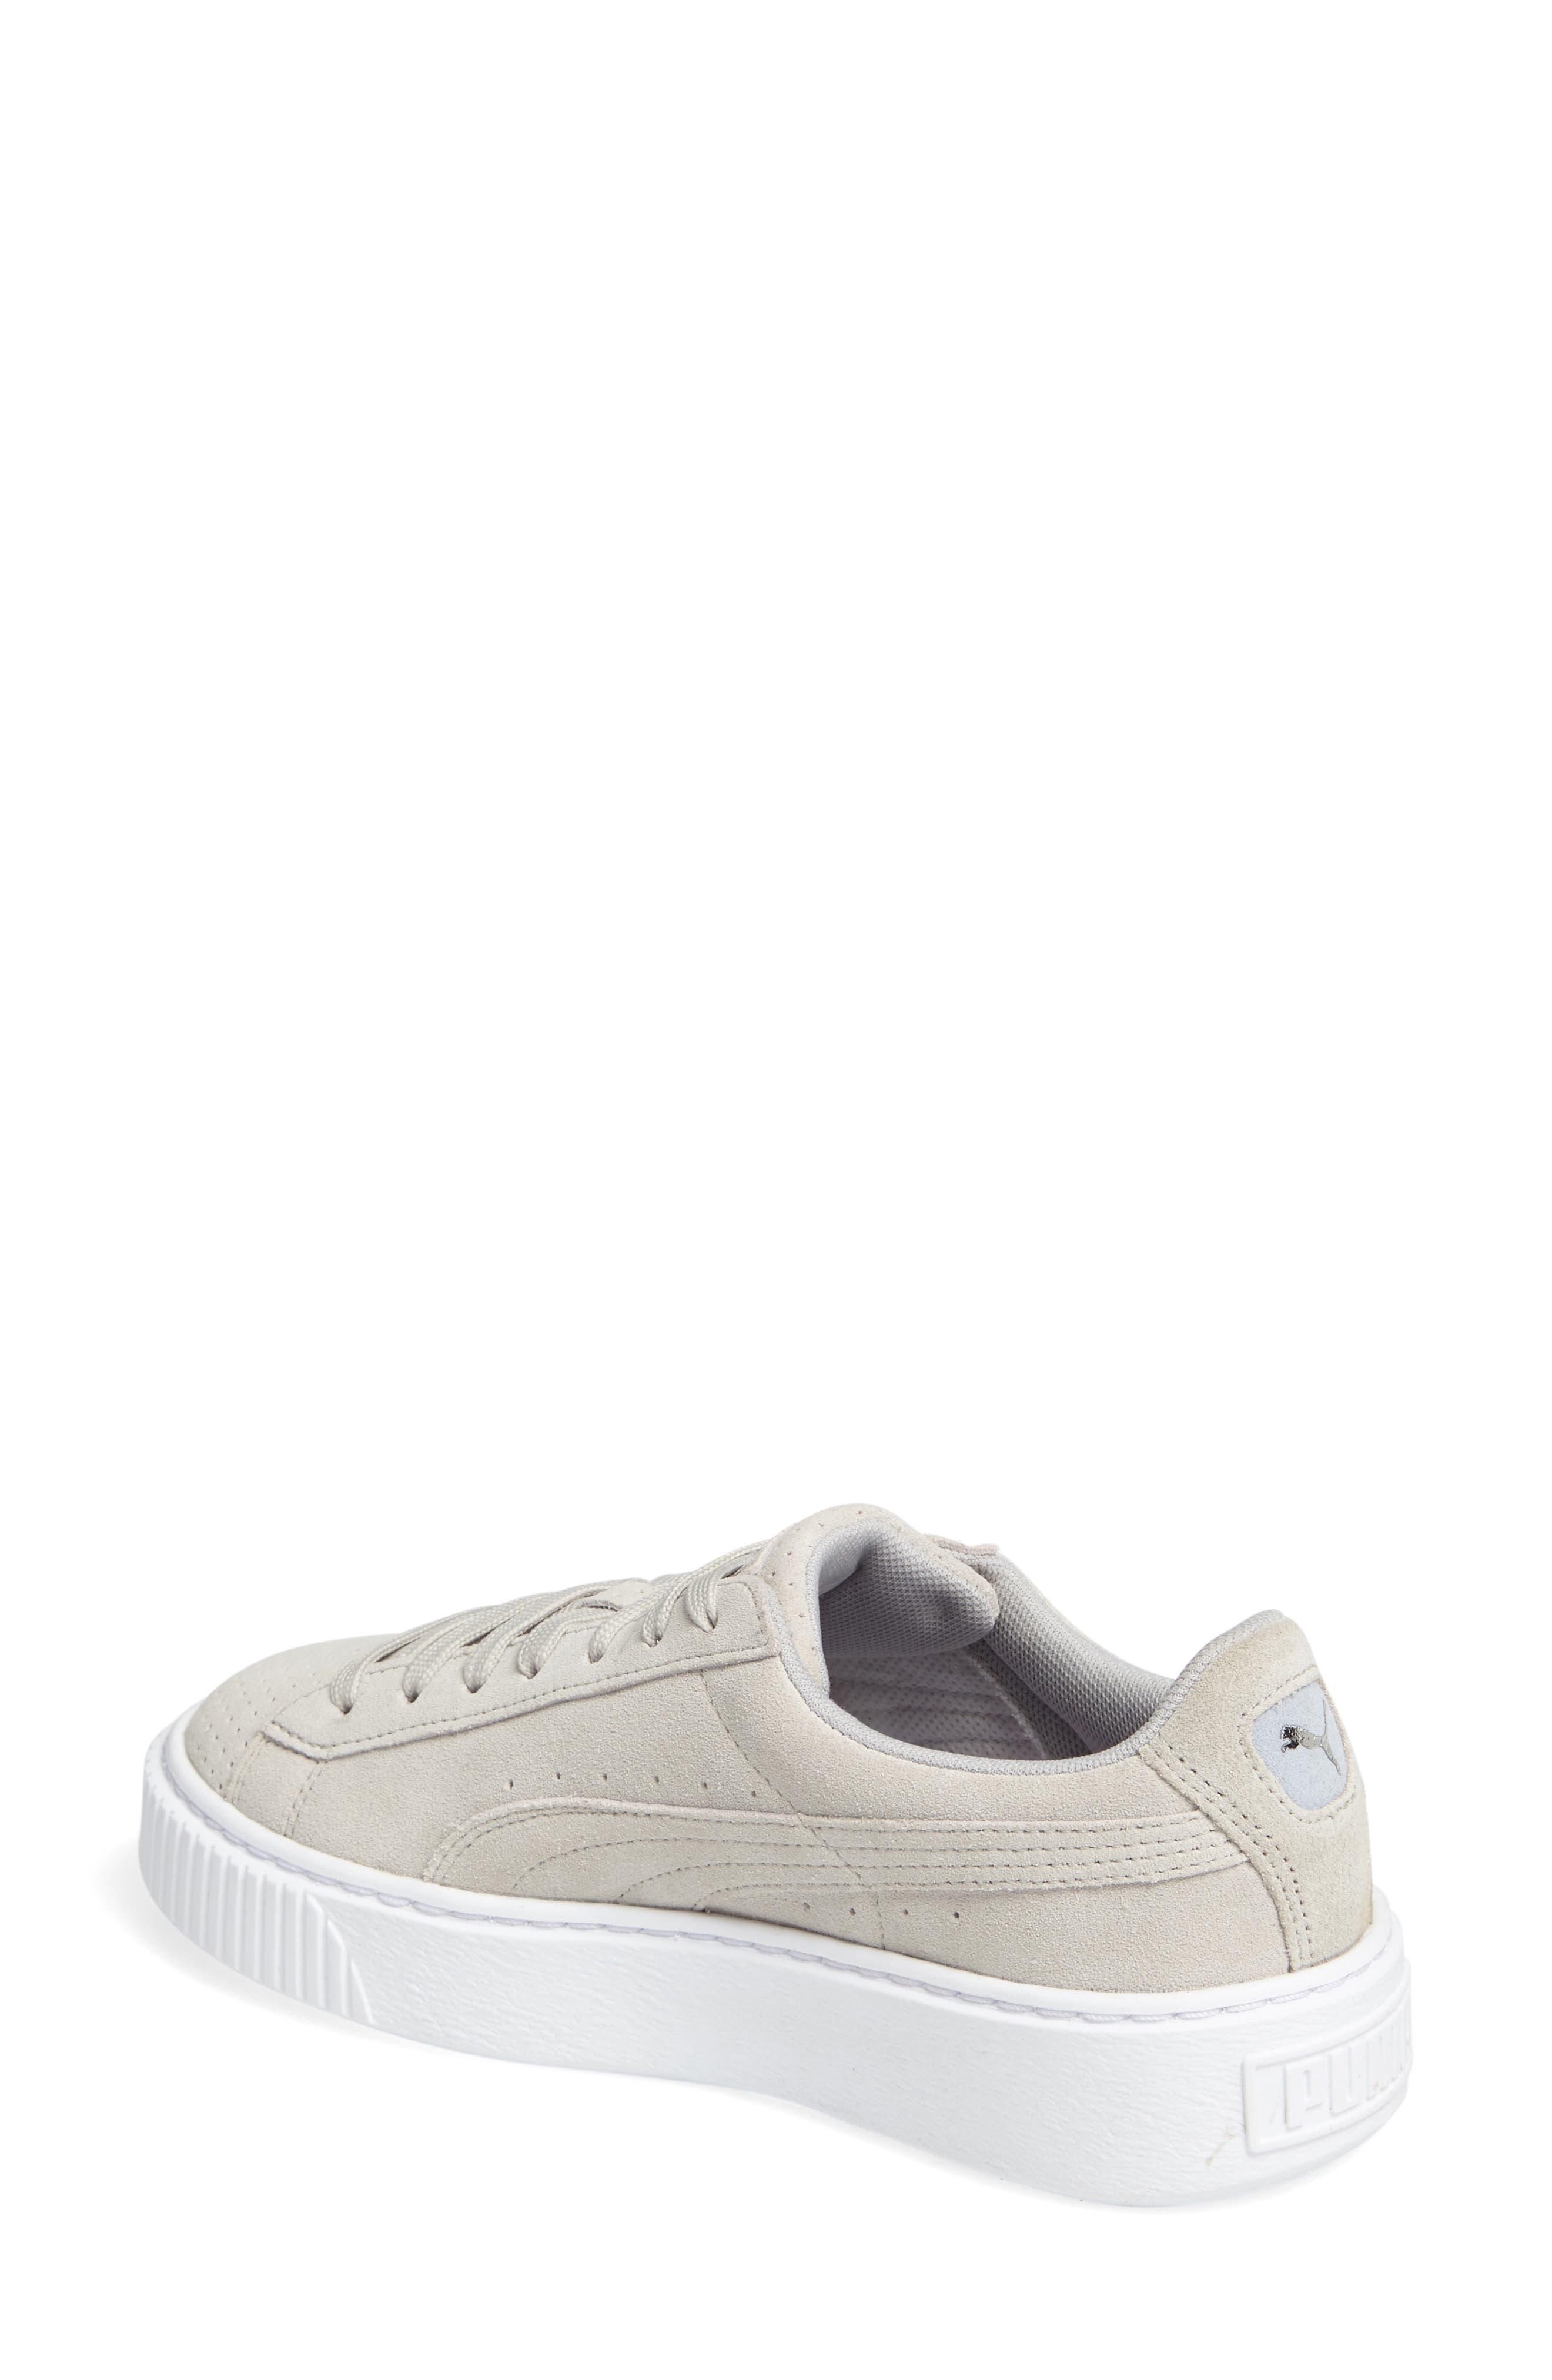 PUMA,                             Basket Platform Sneaker,                             Alternate thumbnail 2, color,                             060